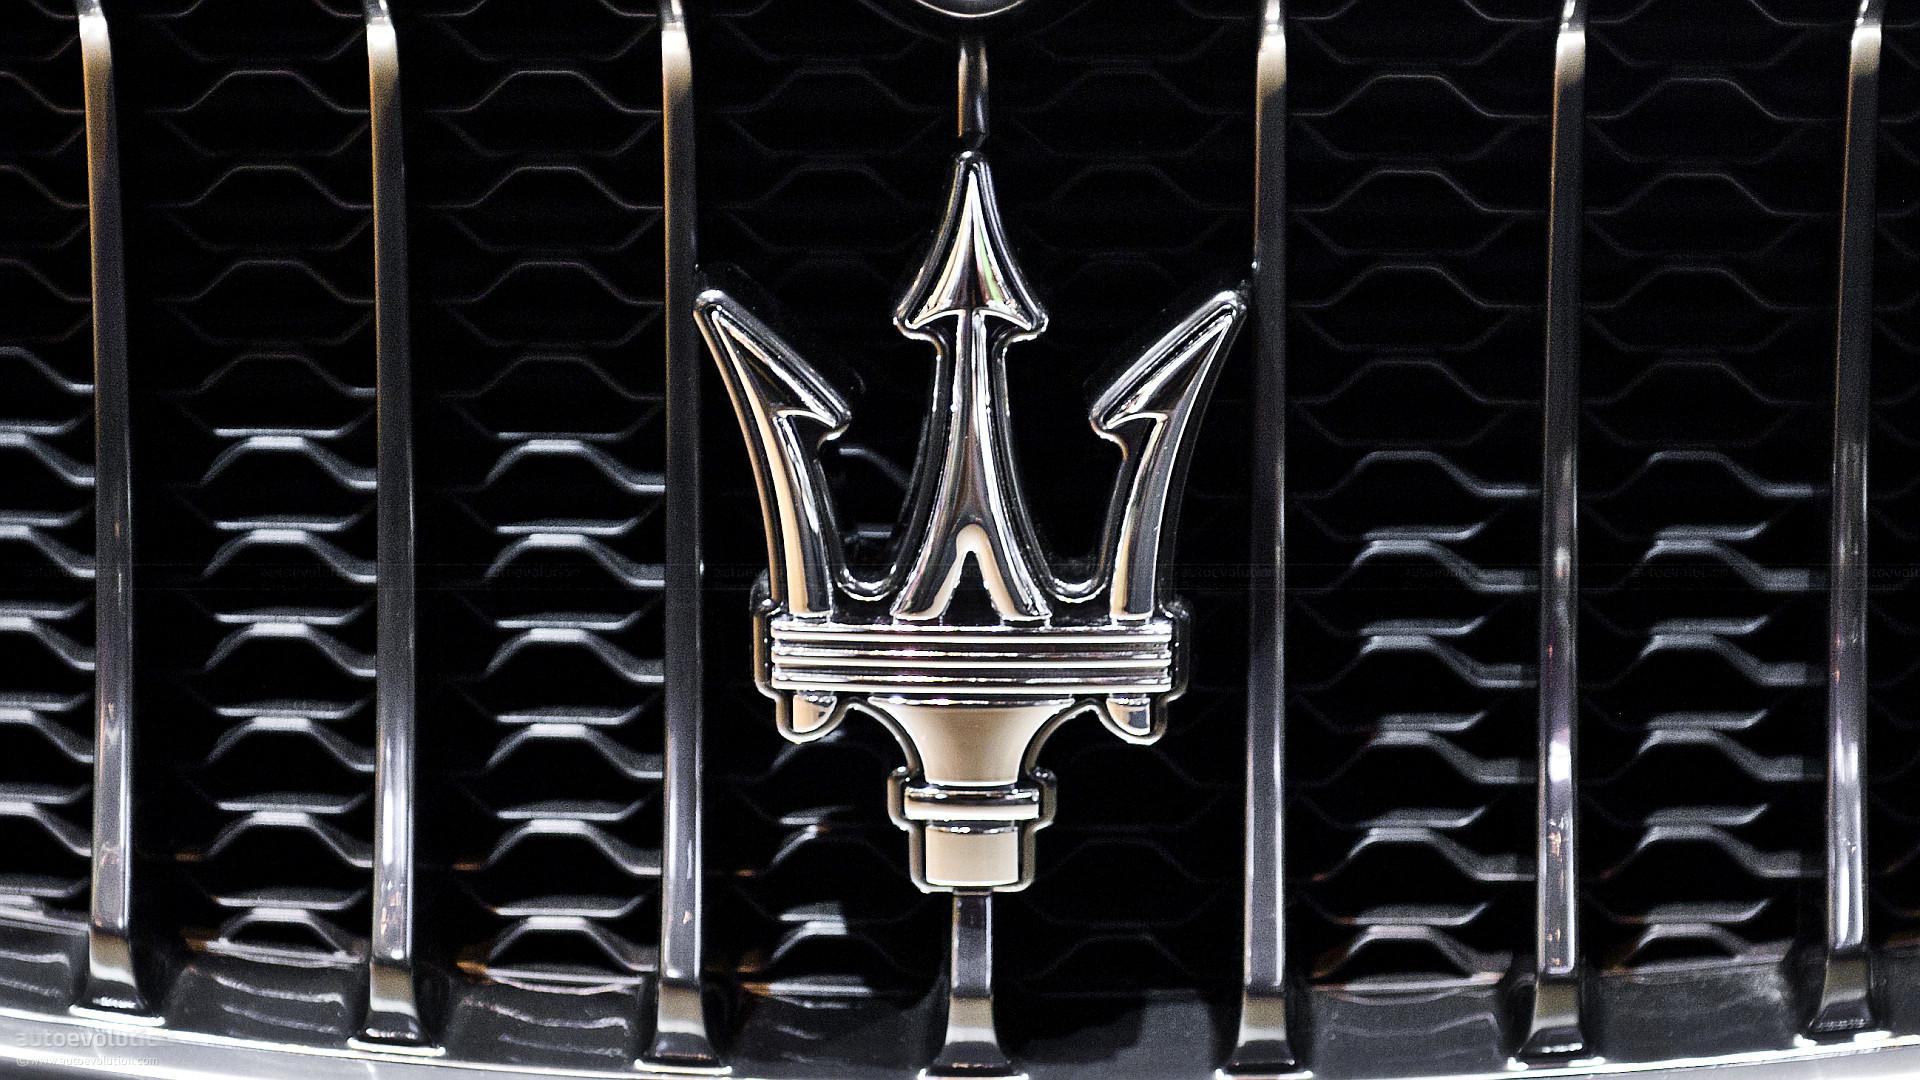 Maserati car logo wallpaper hd